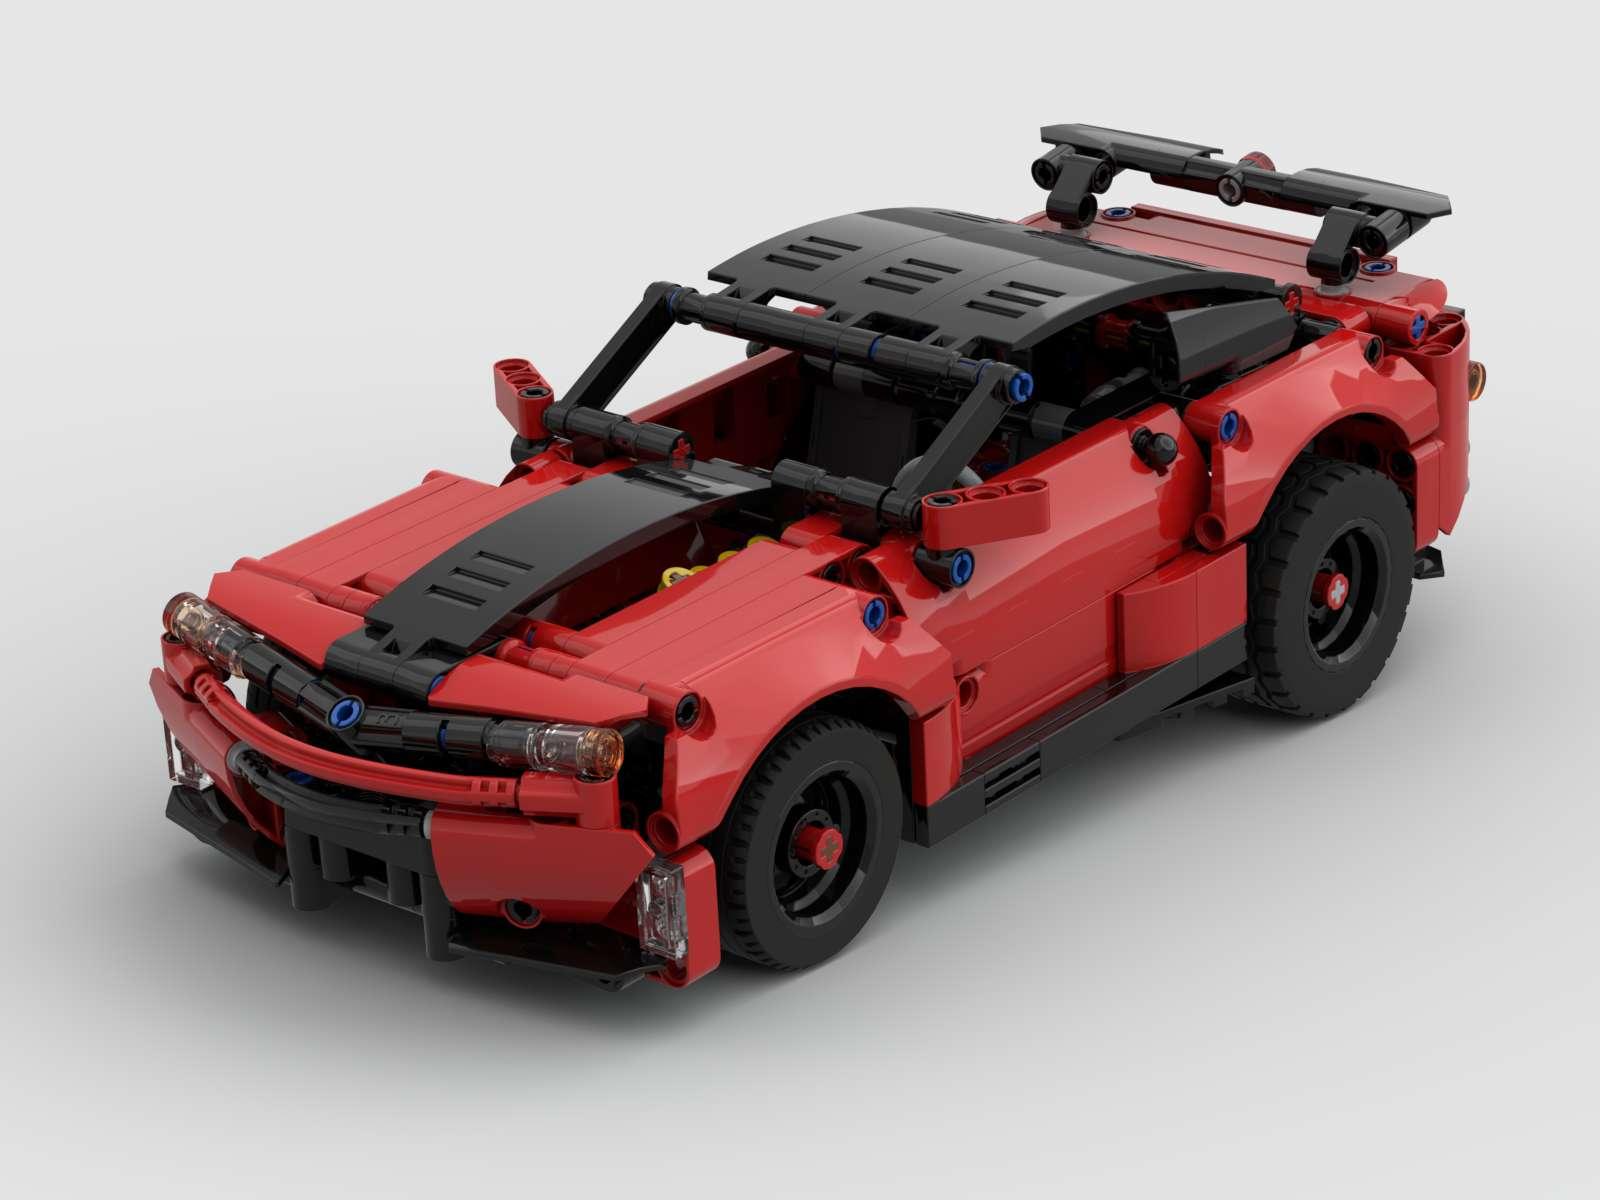 42098-blue-car-mod-red.jpg